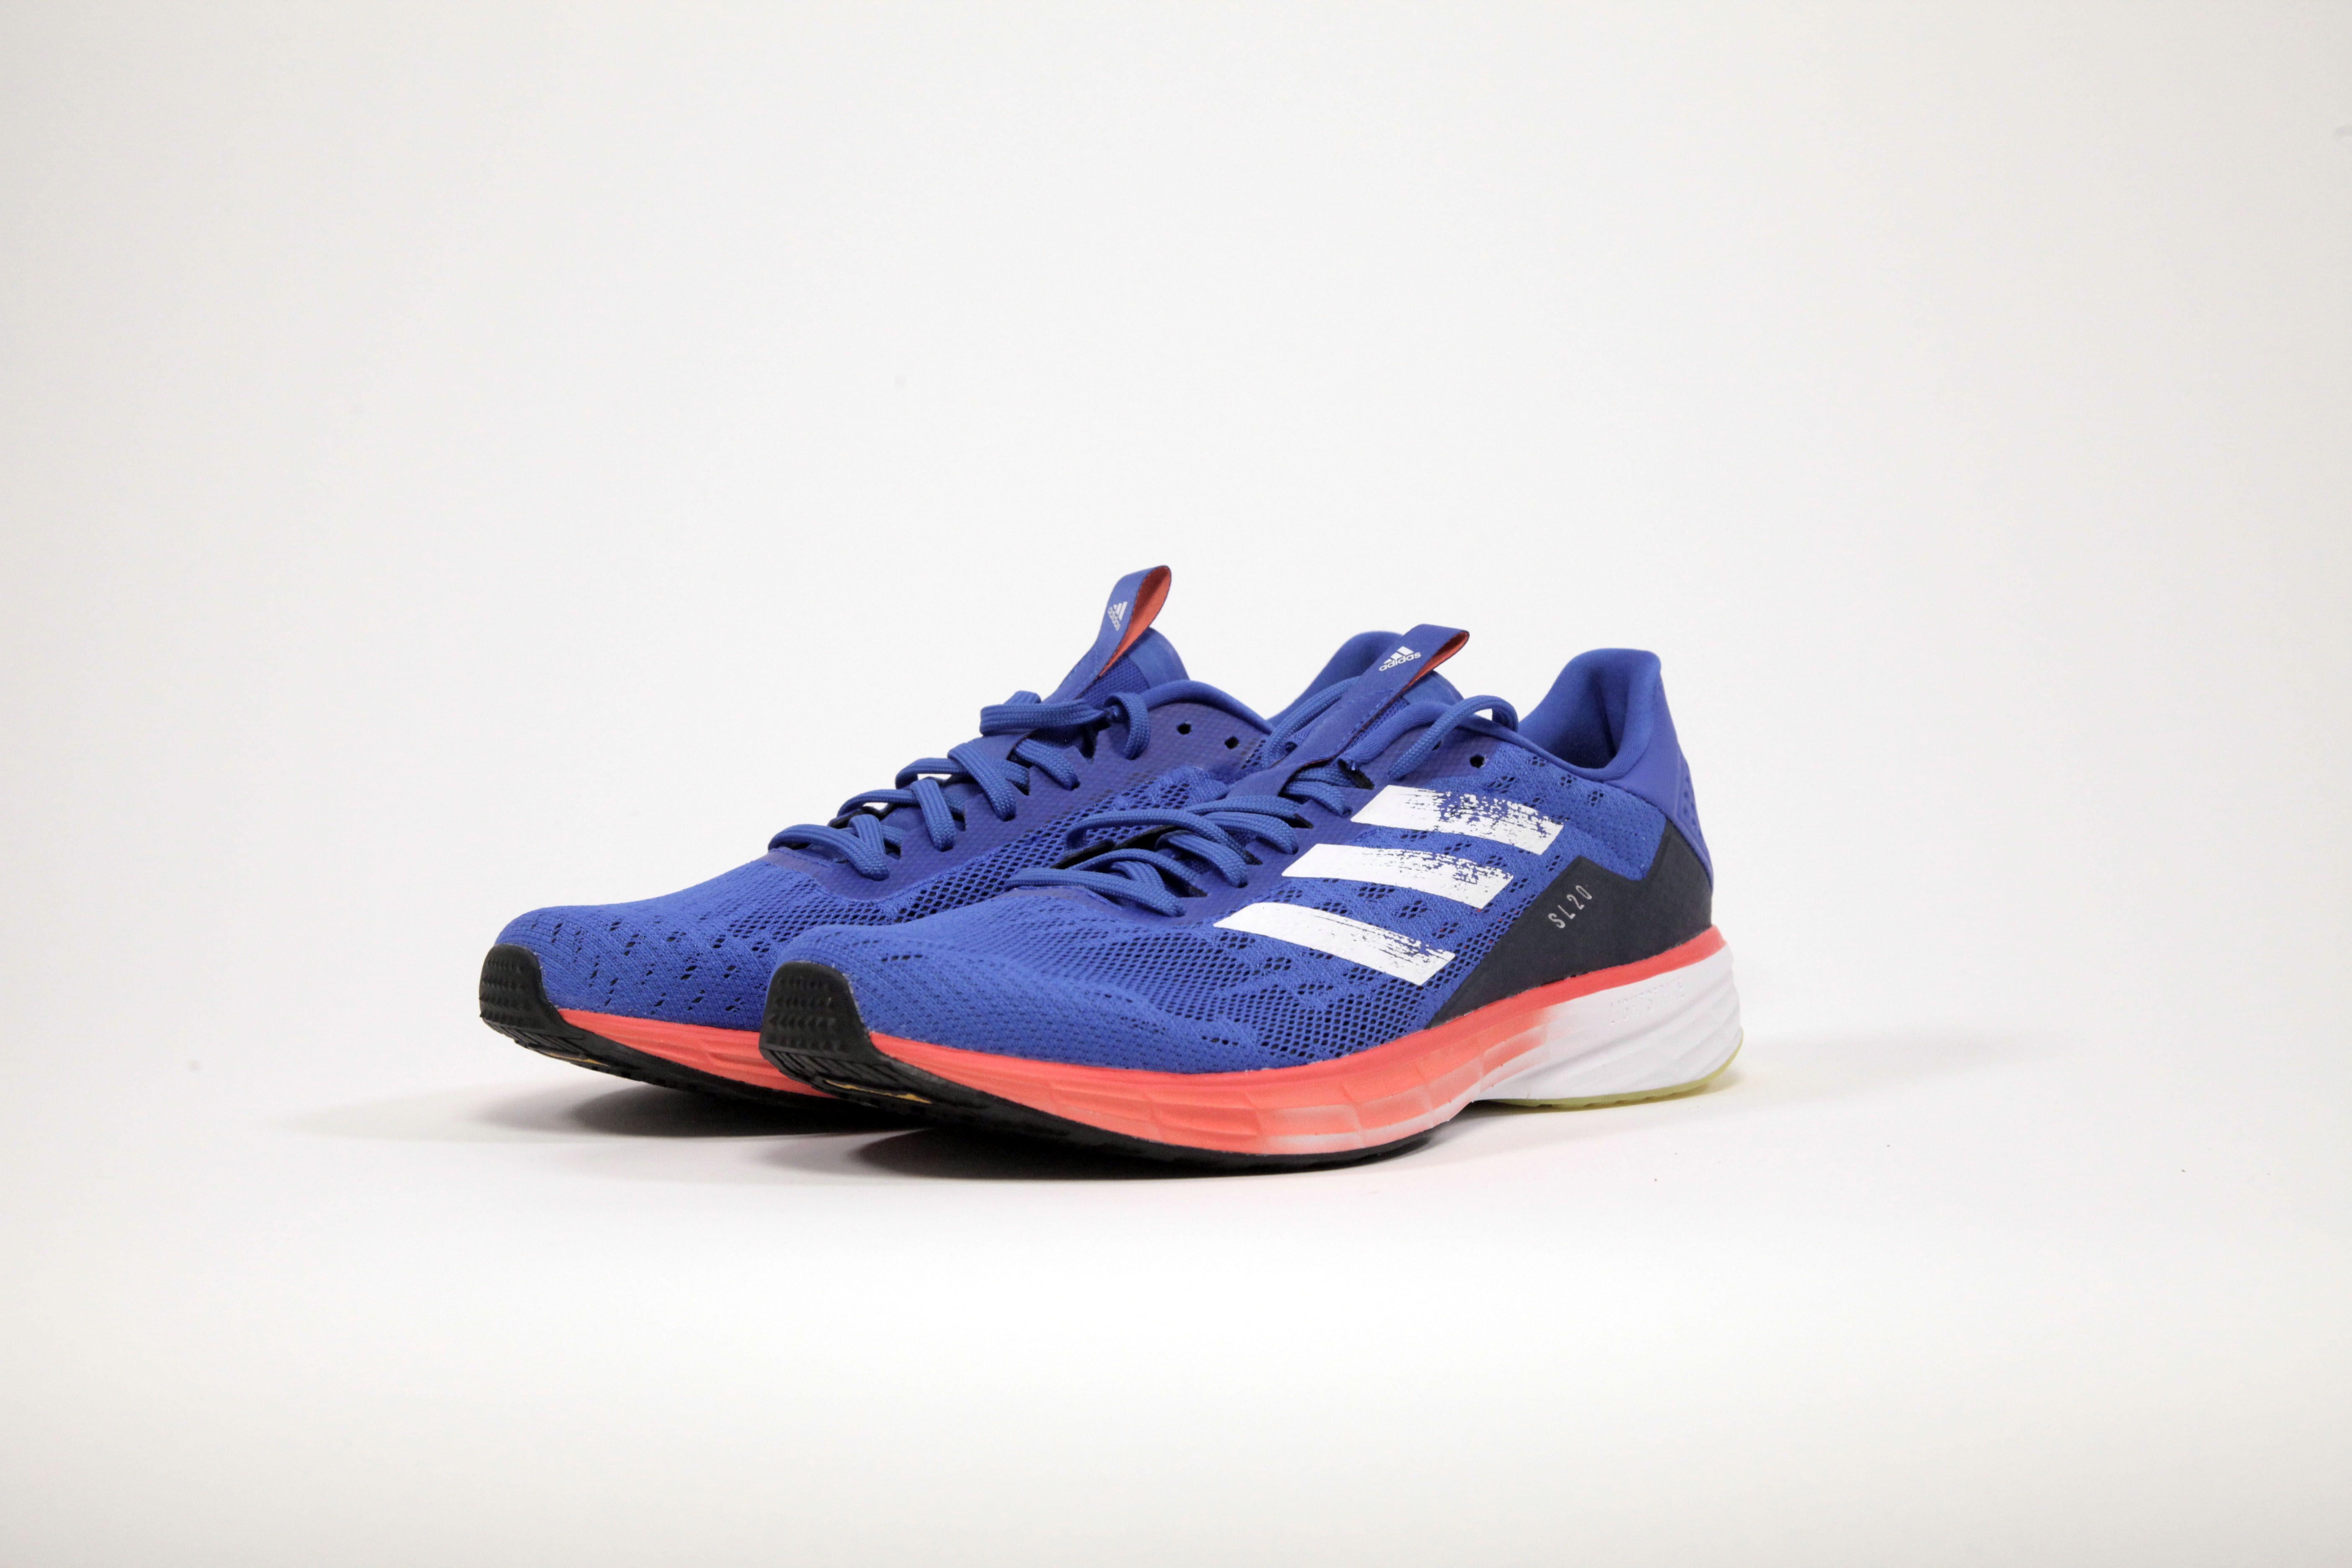 Fondos Tradicion Envío  adidas cq2122 women wear | Adidas SL20 running shoe review 2020